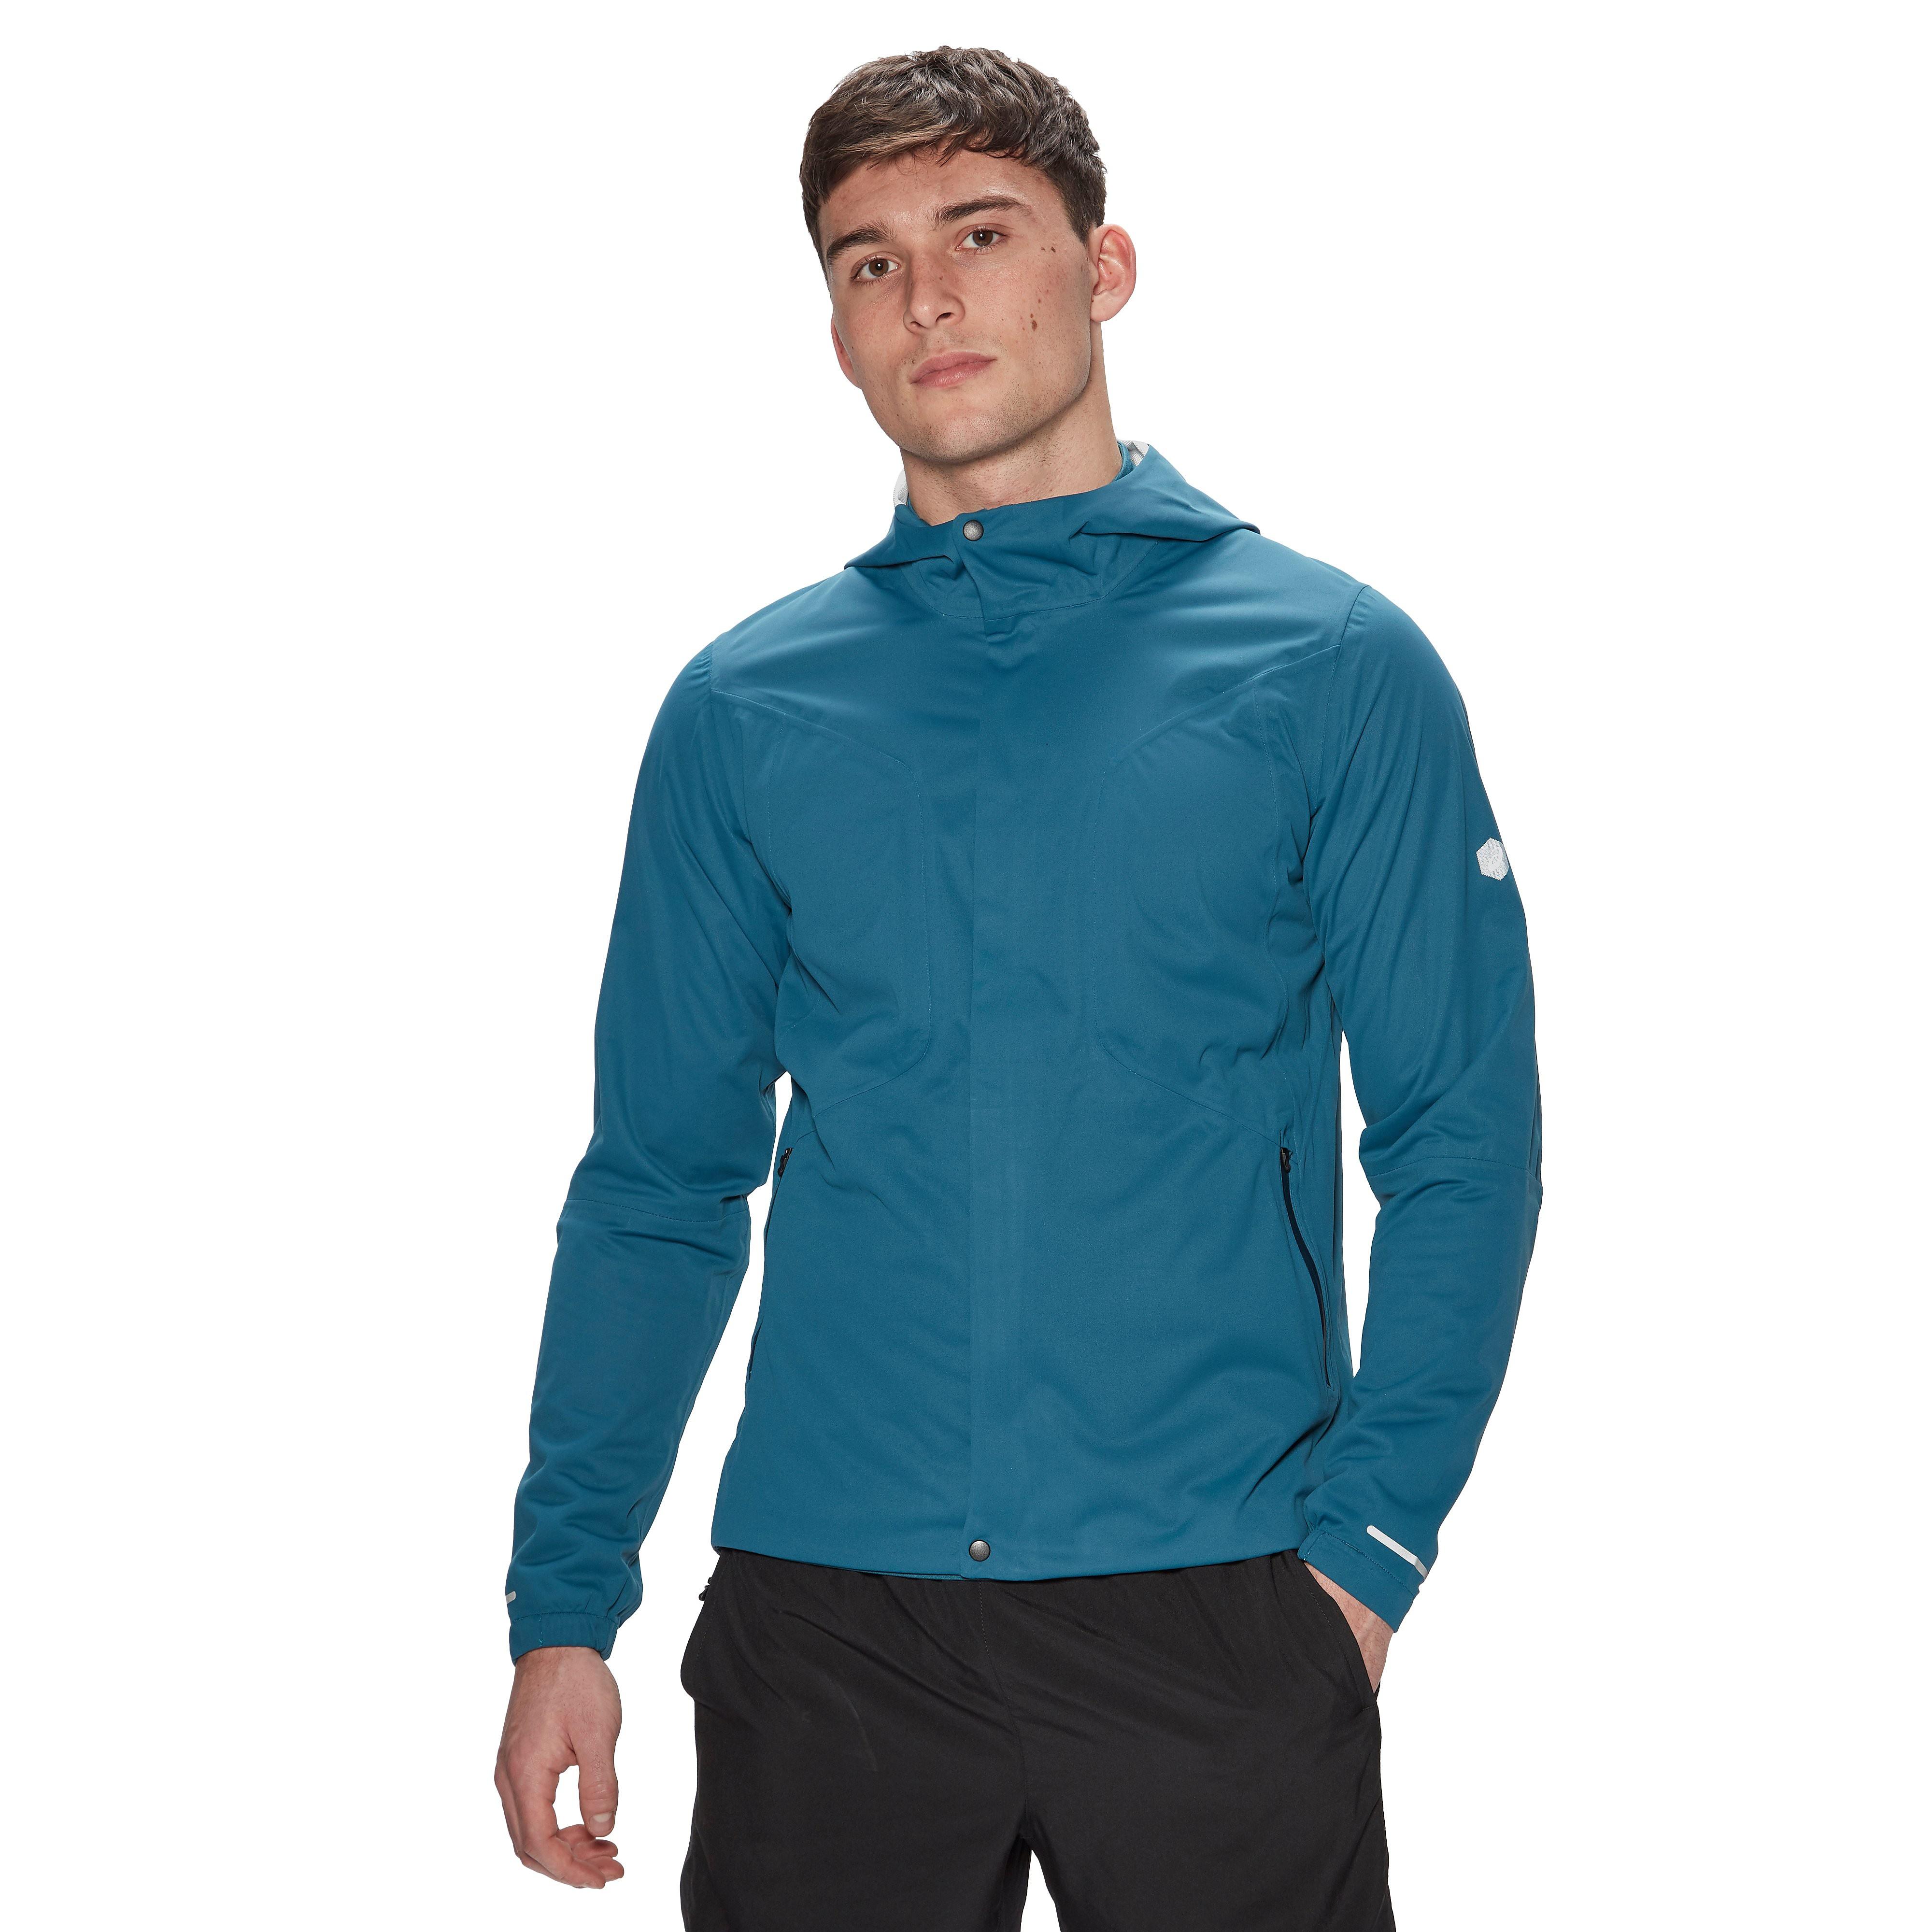 Men's ASICS Accelerate Running Jacket - Blue, Blue